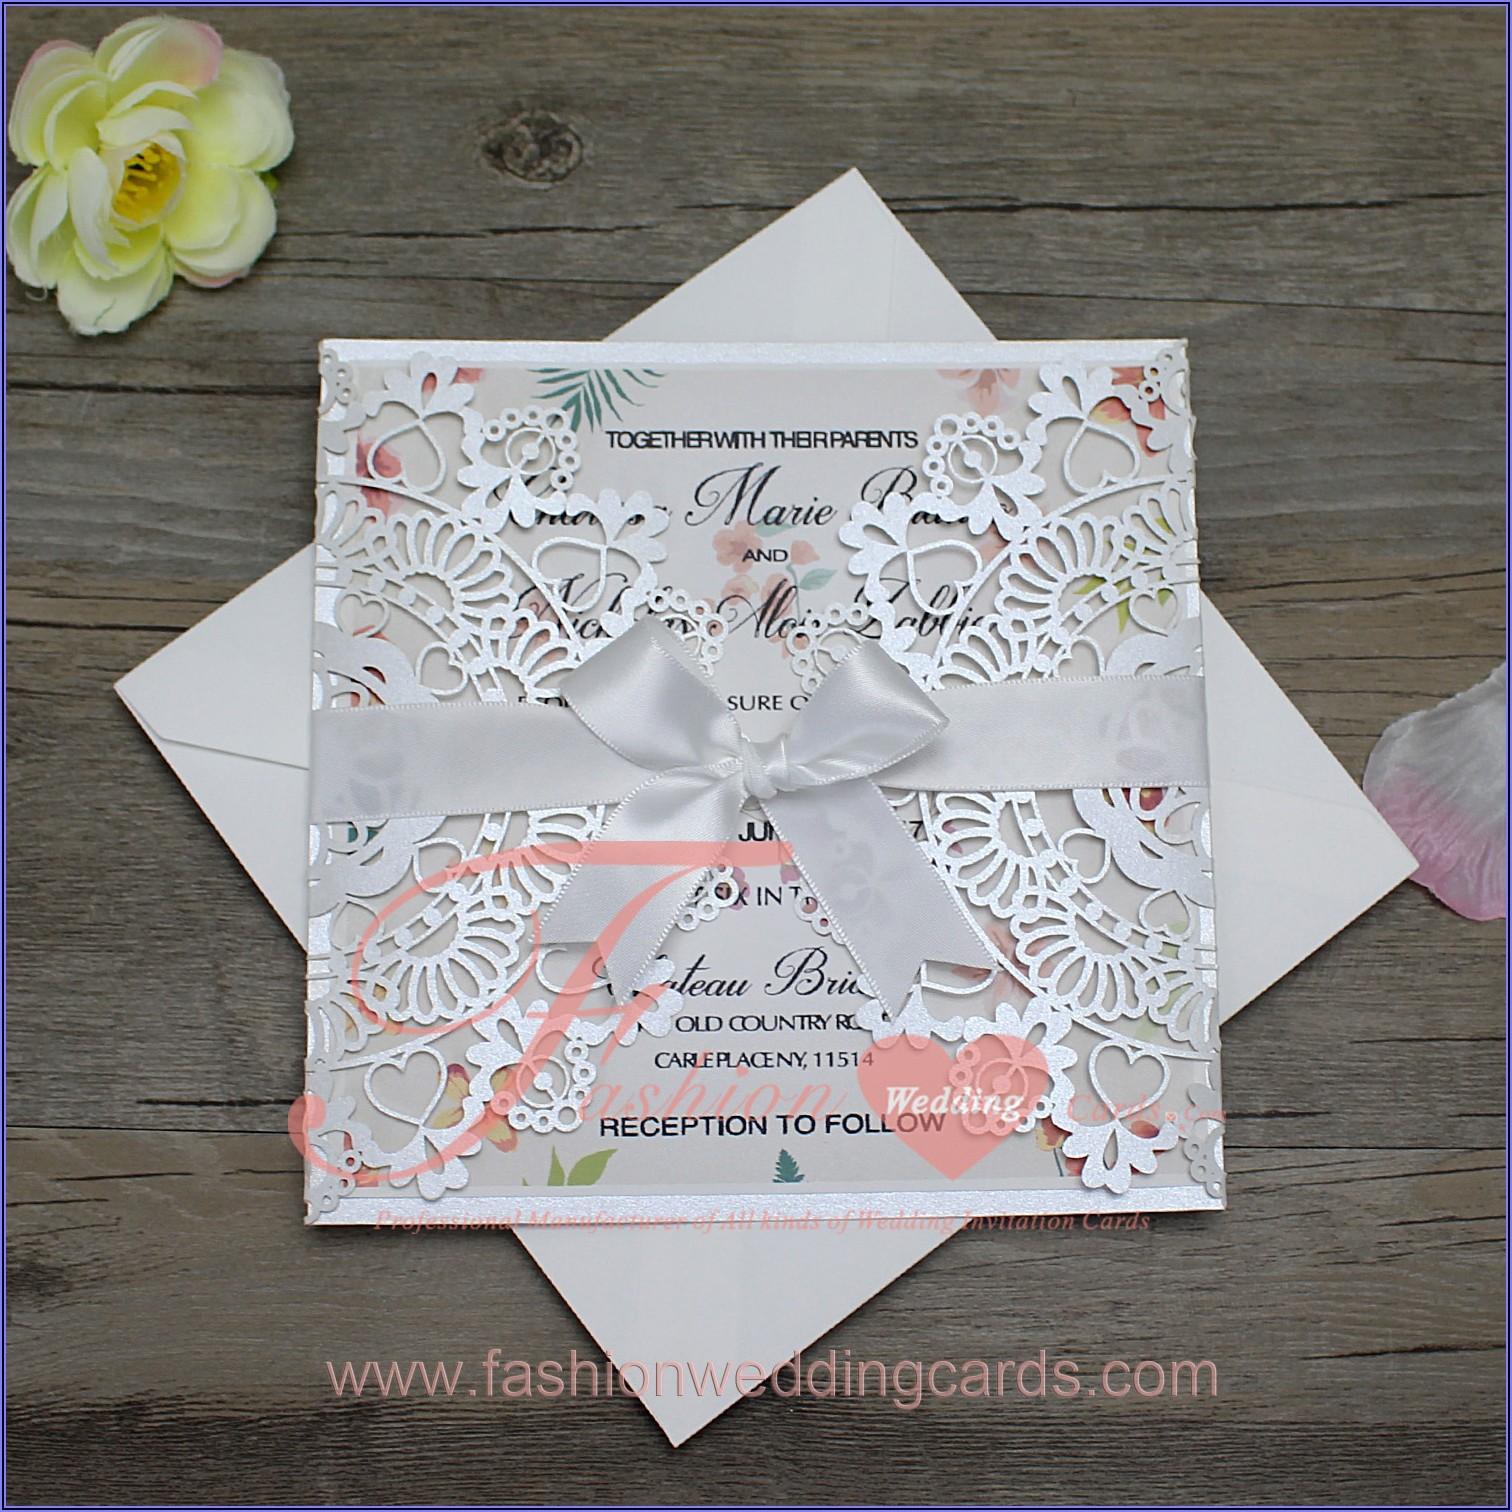 Cheap Laser Cut Wedding Invitations Uk